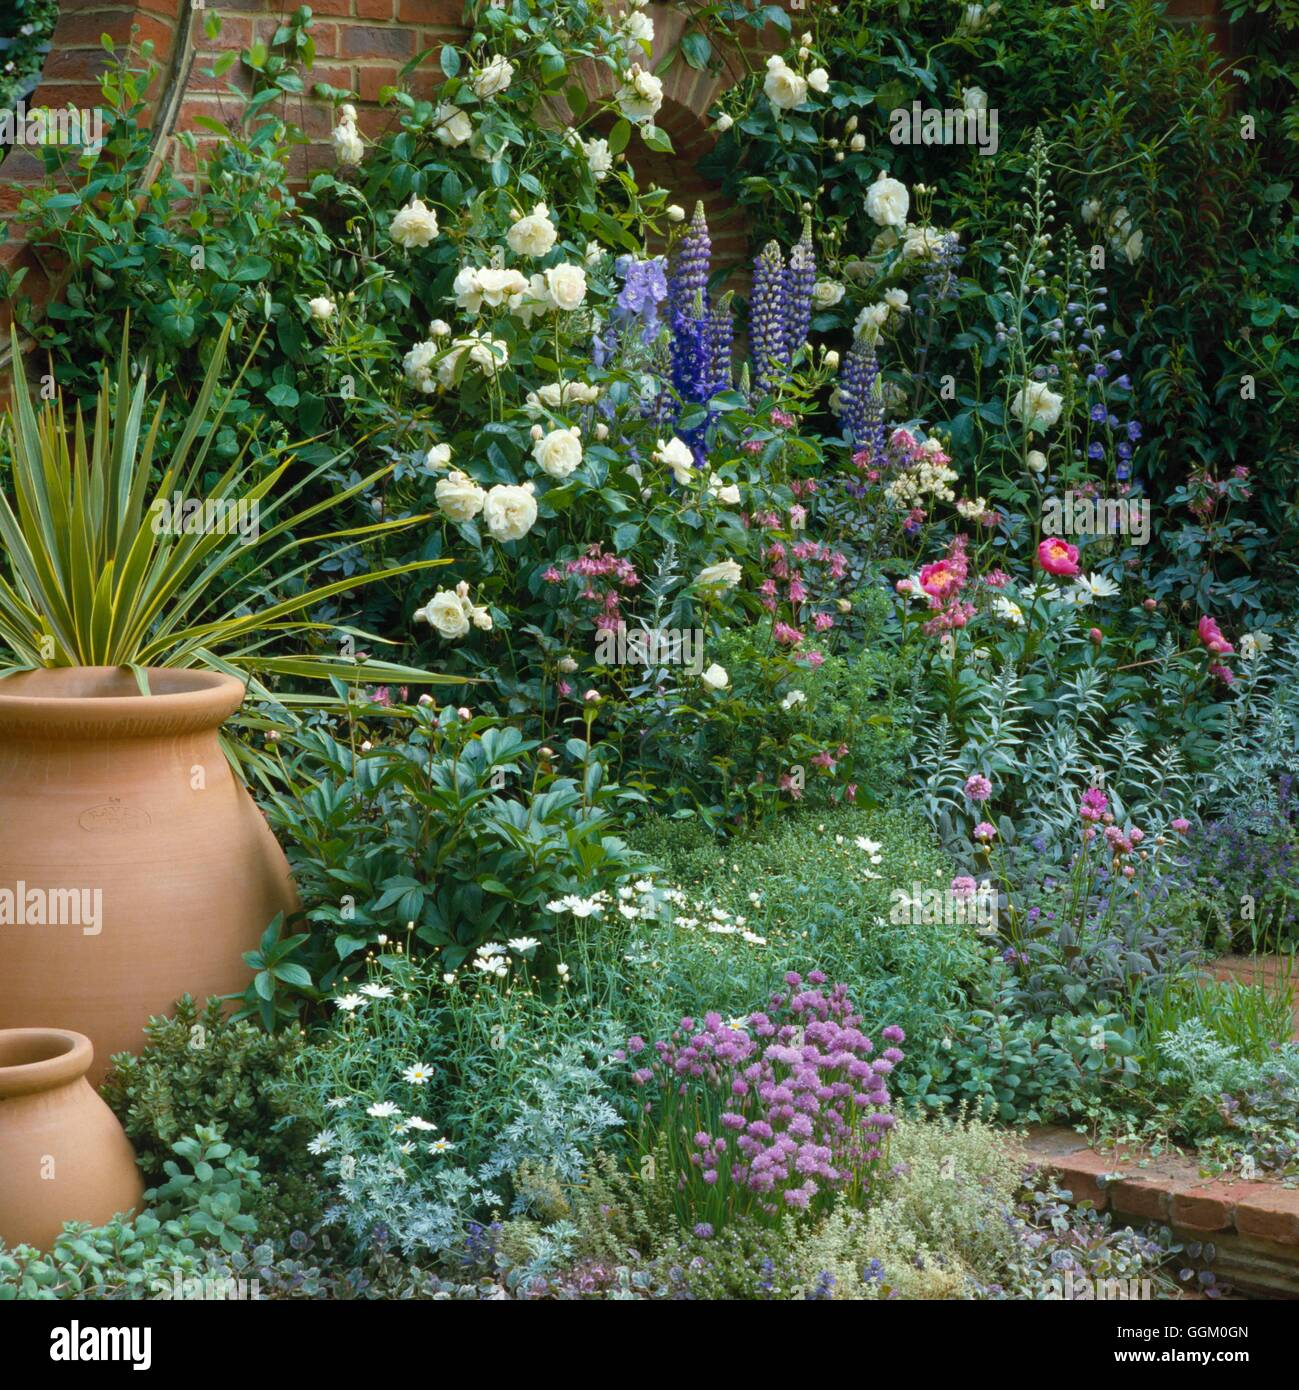 Mixed Border - with Roses and Perennials- - (Please Credit: Photos Hort/ Designer Andrea Parsons)   MXB057251  Compuls - Stock Image